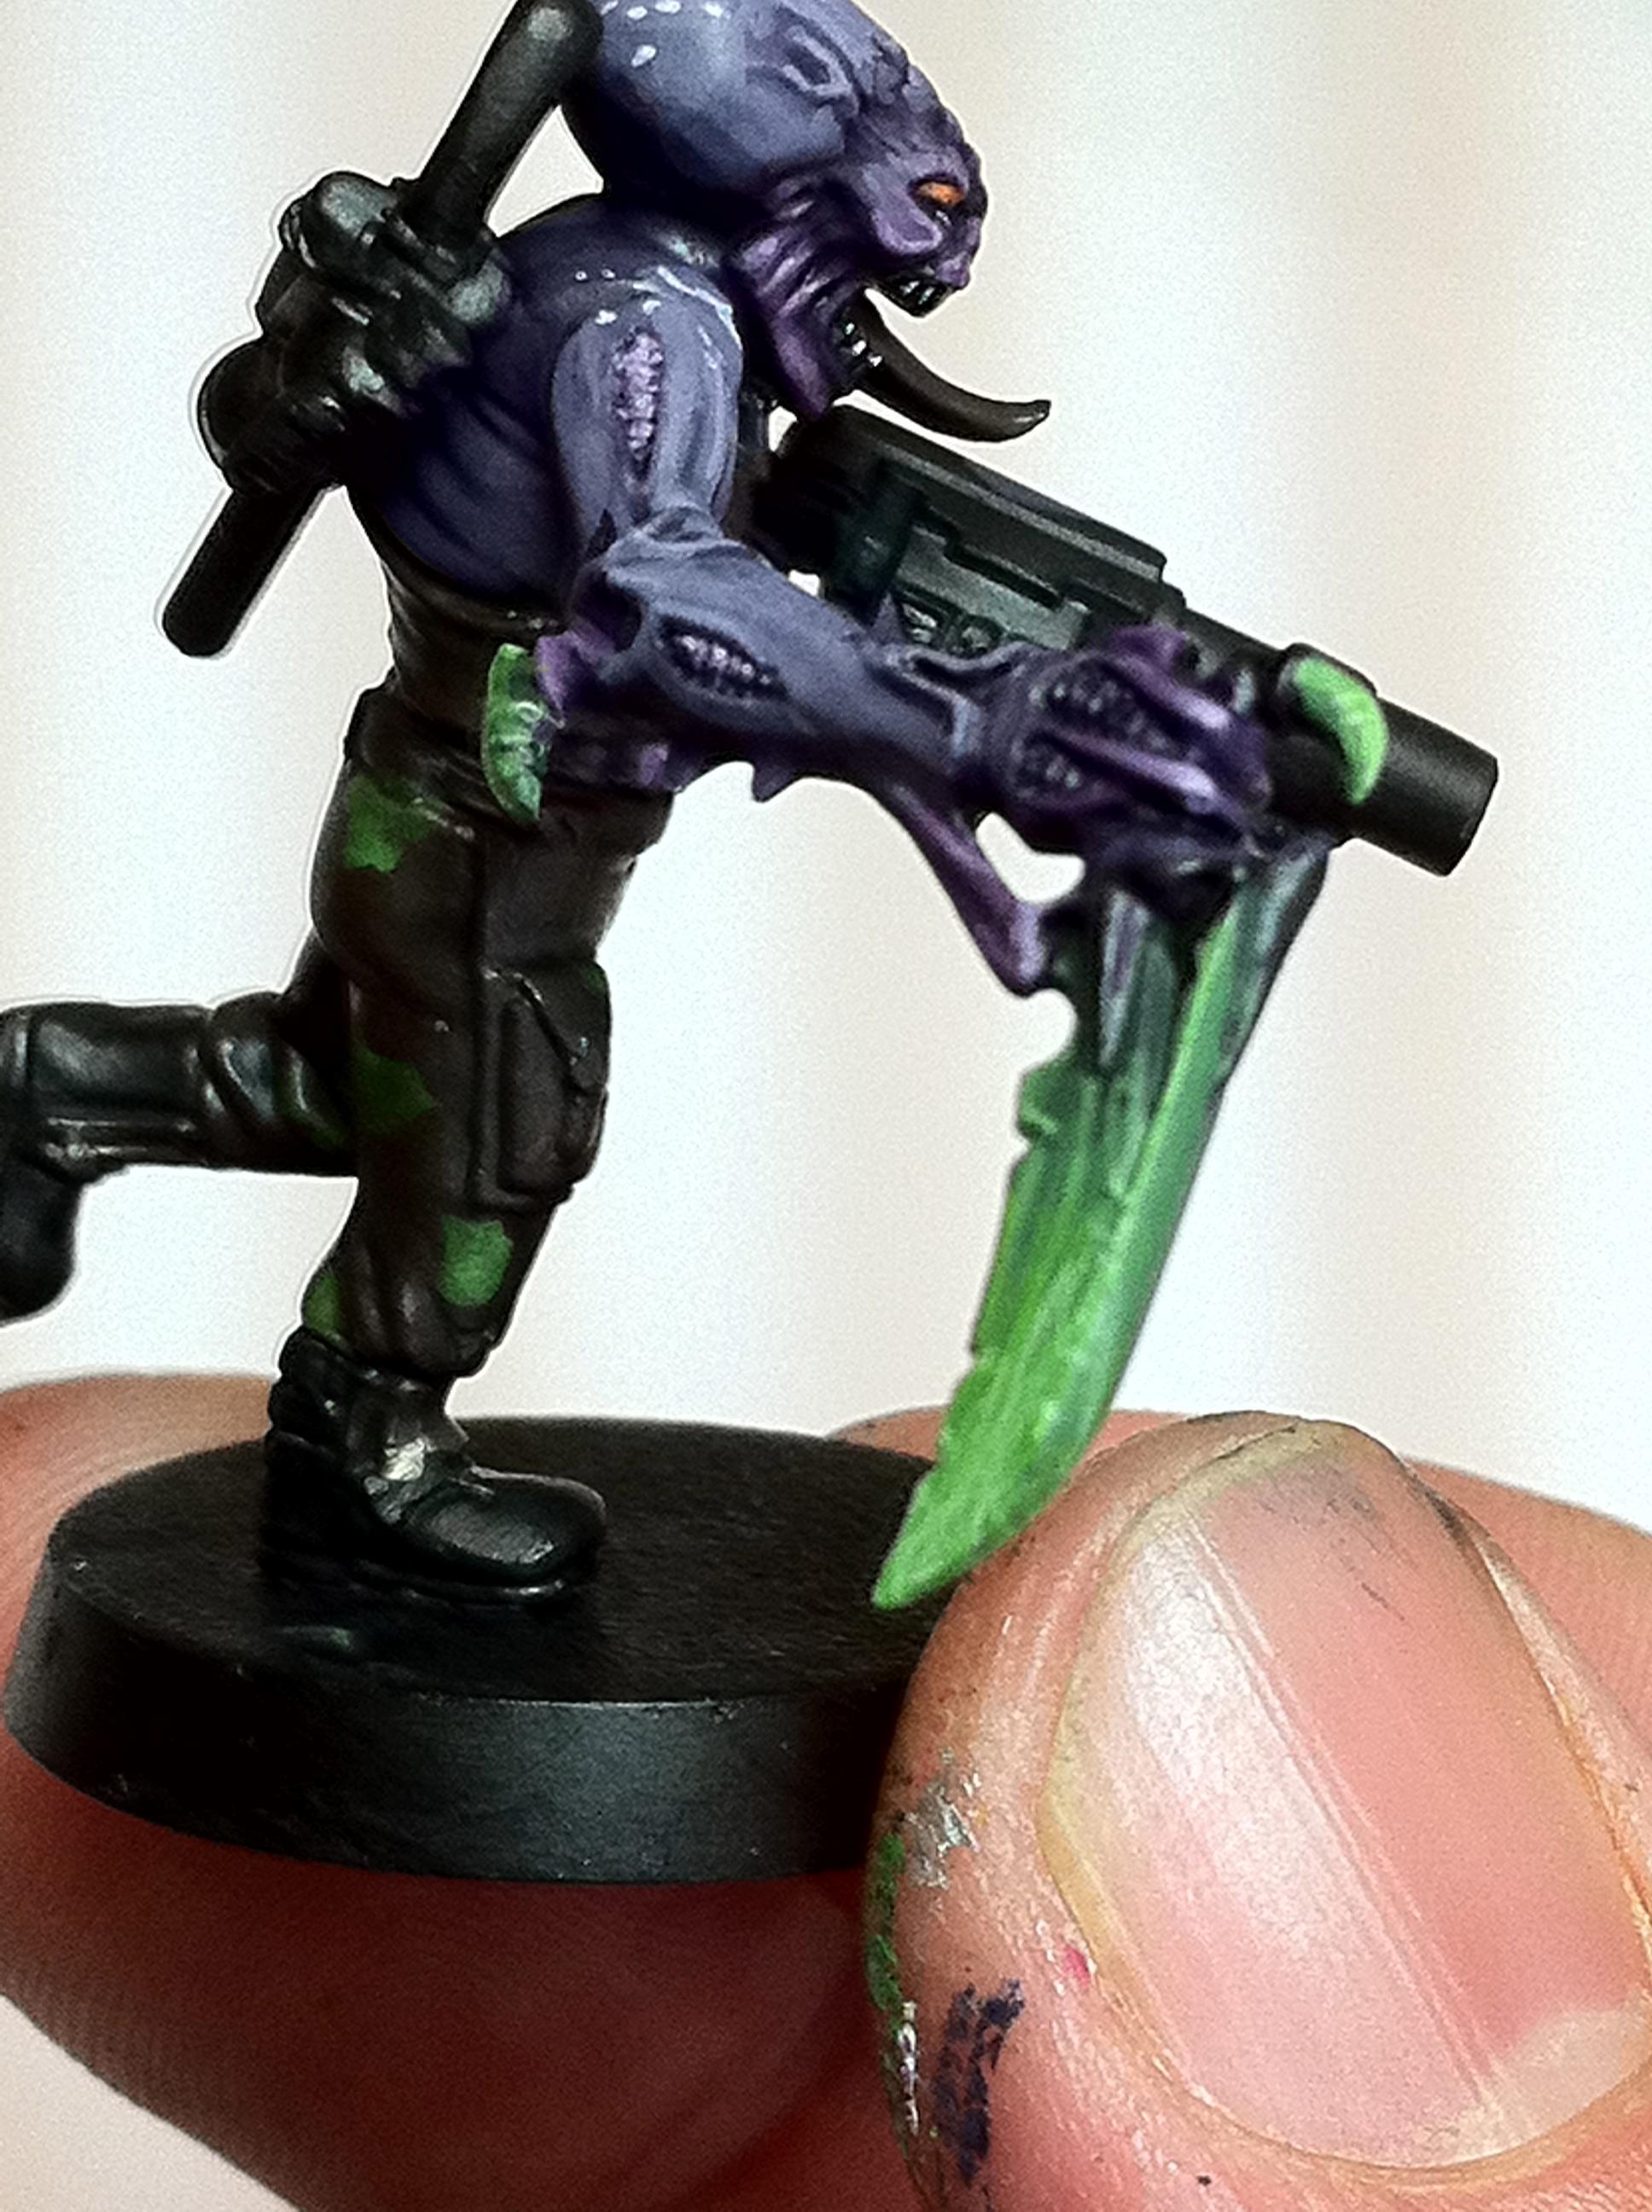 Catachan, Genestealer Cult, Imperial Guard